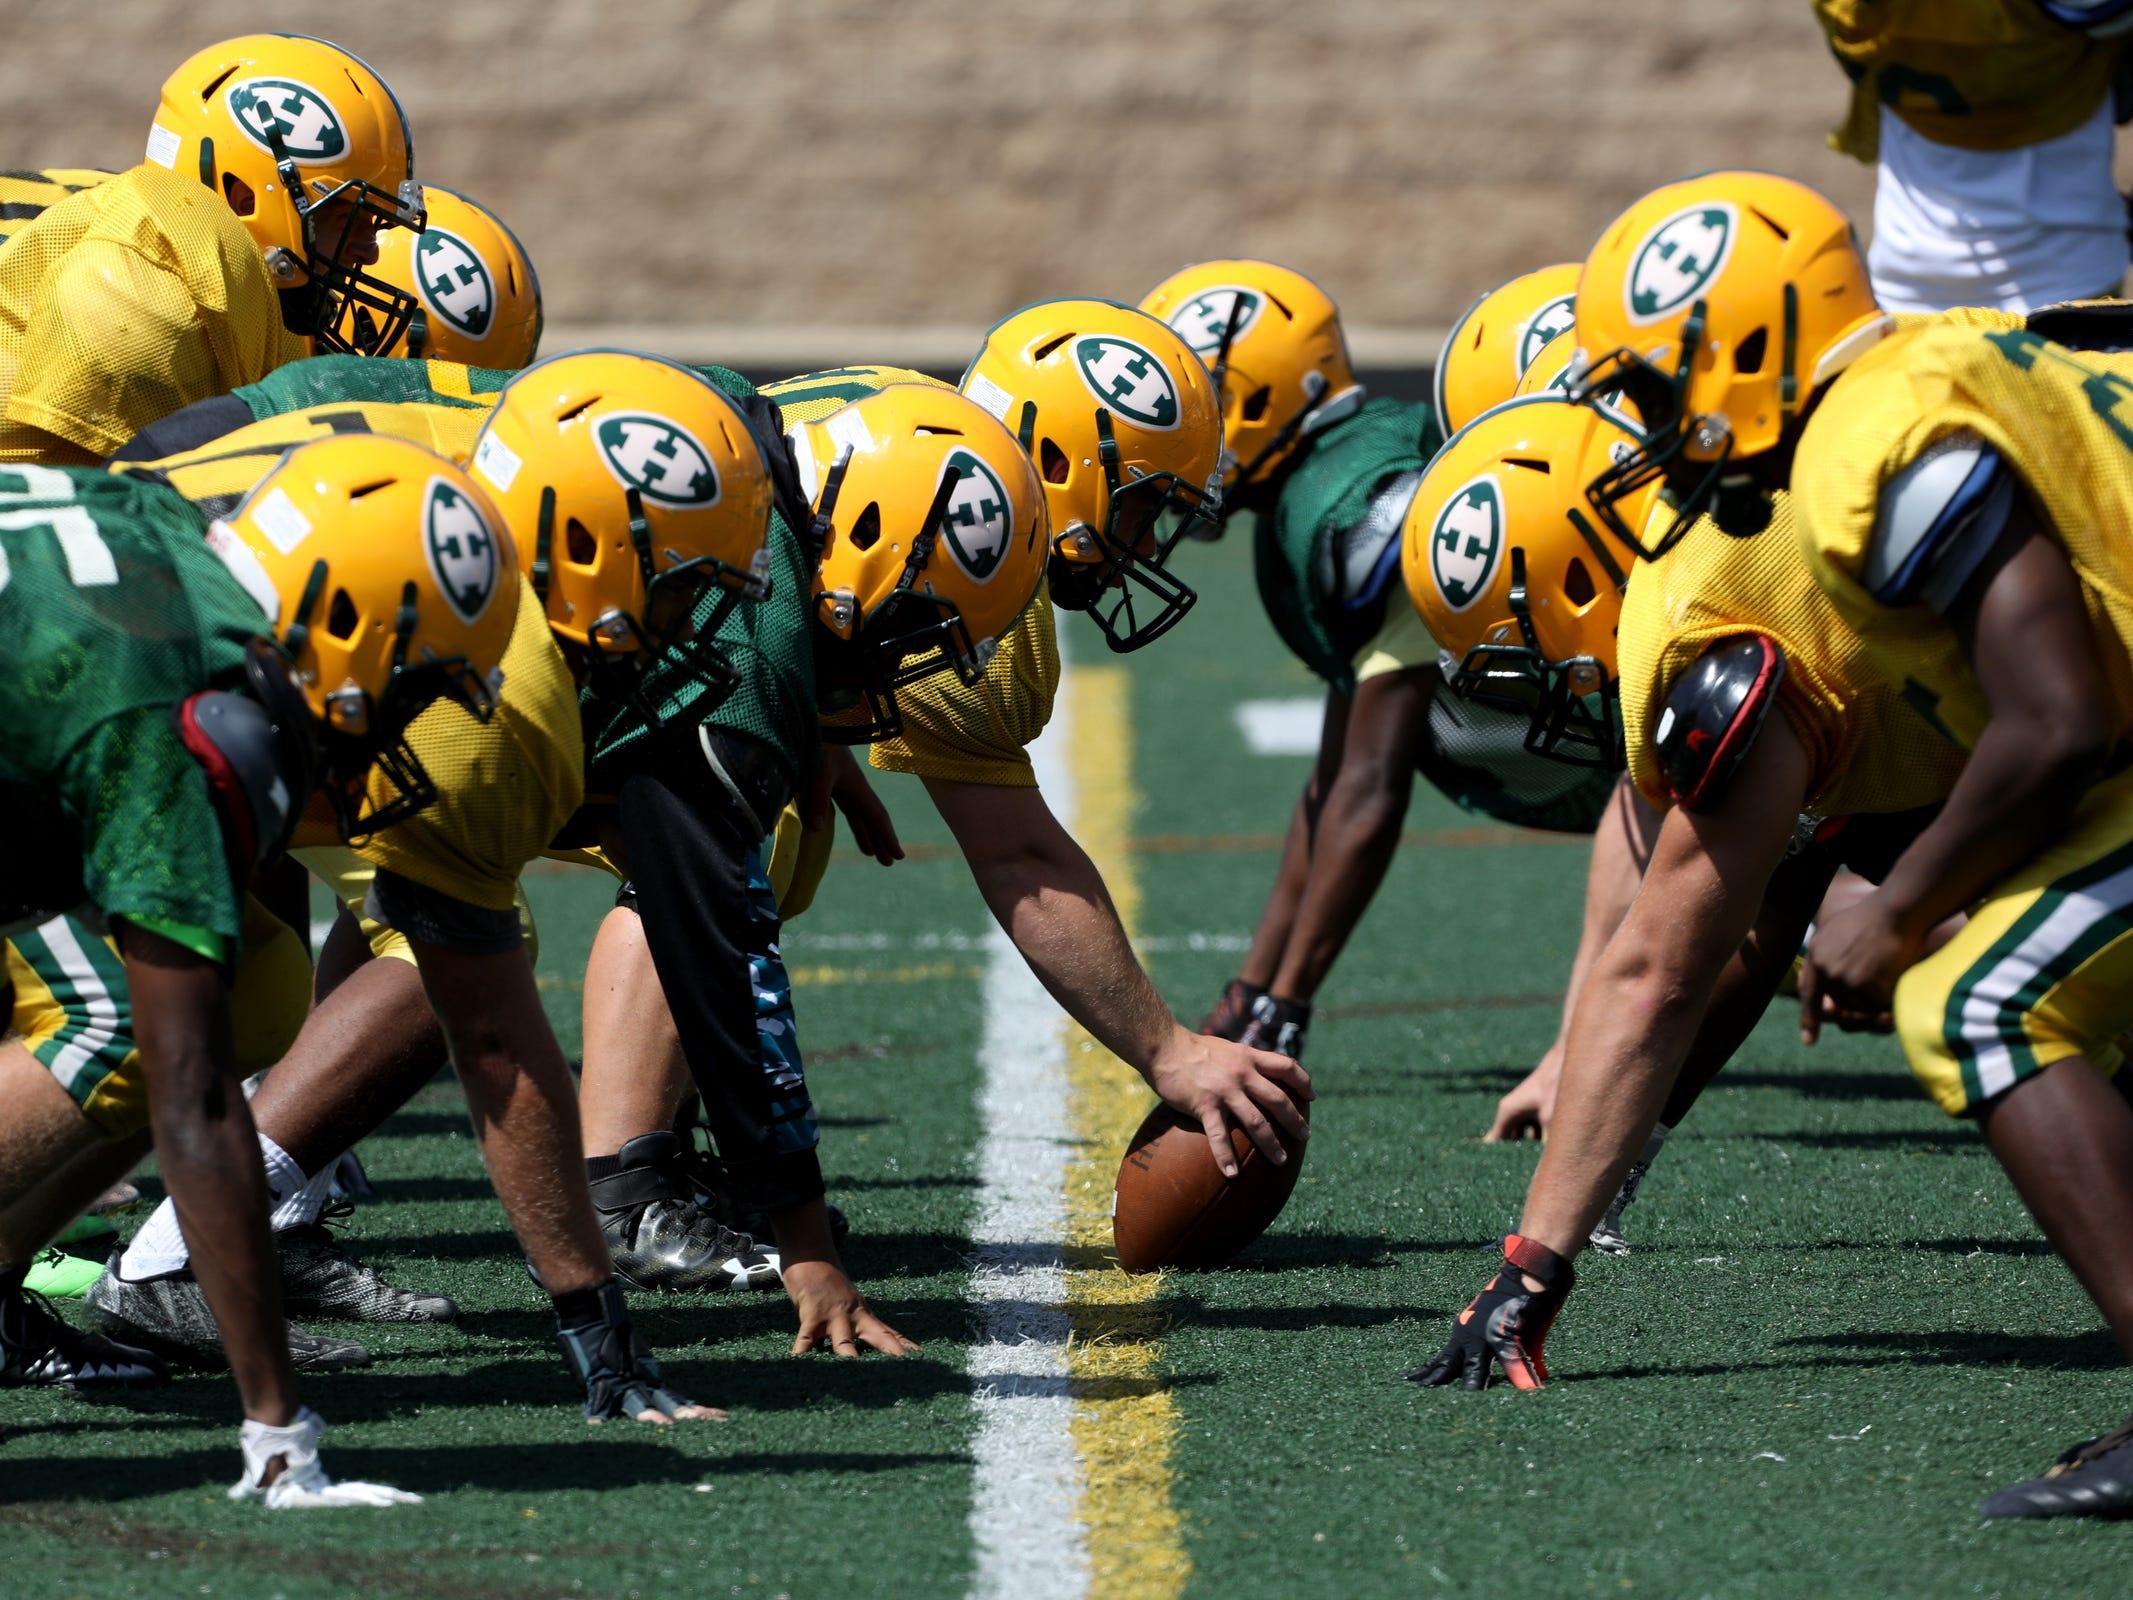 The Farmington Hills Harrison High School football team practice at the five yard line during end zone drills during Farmington Hills Harrison High School football practice at the school in Farmington Hills on Thursday, Aug. 23, 2018.